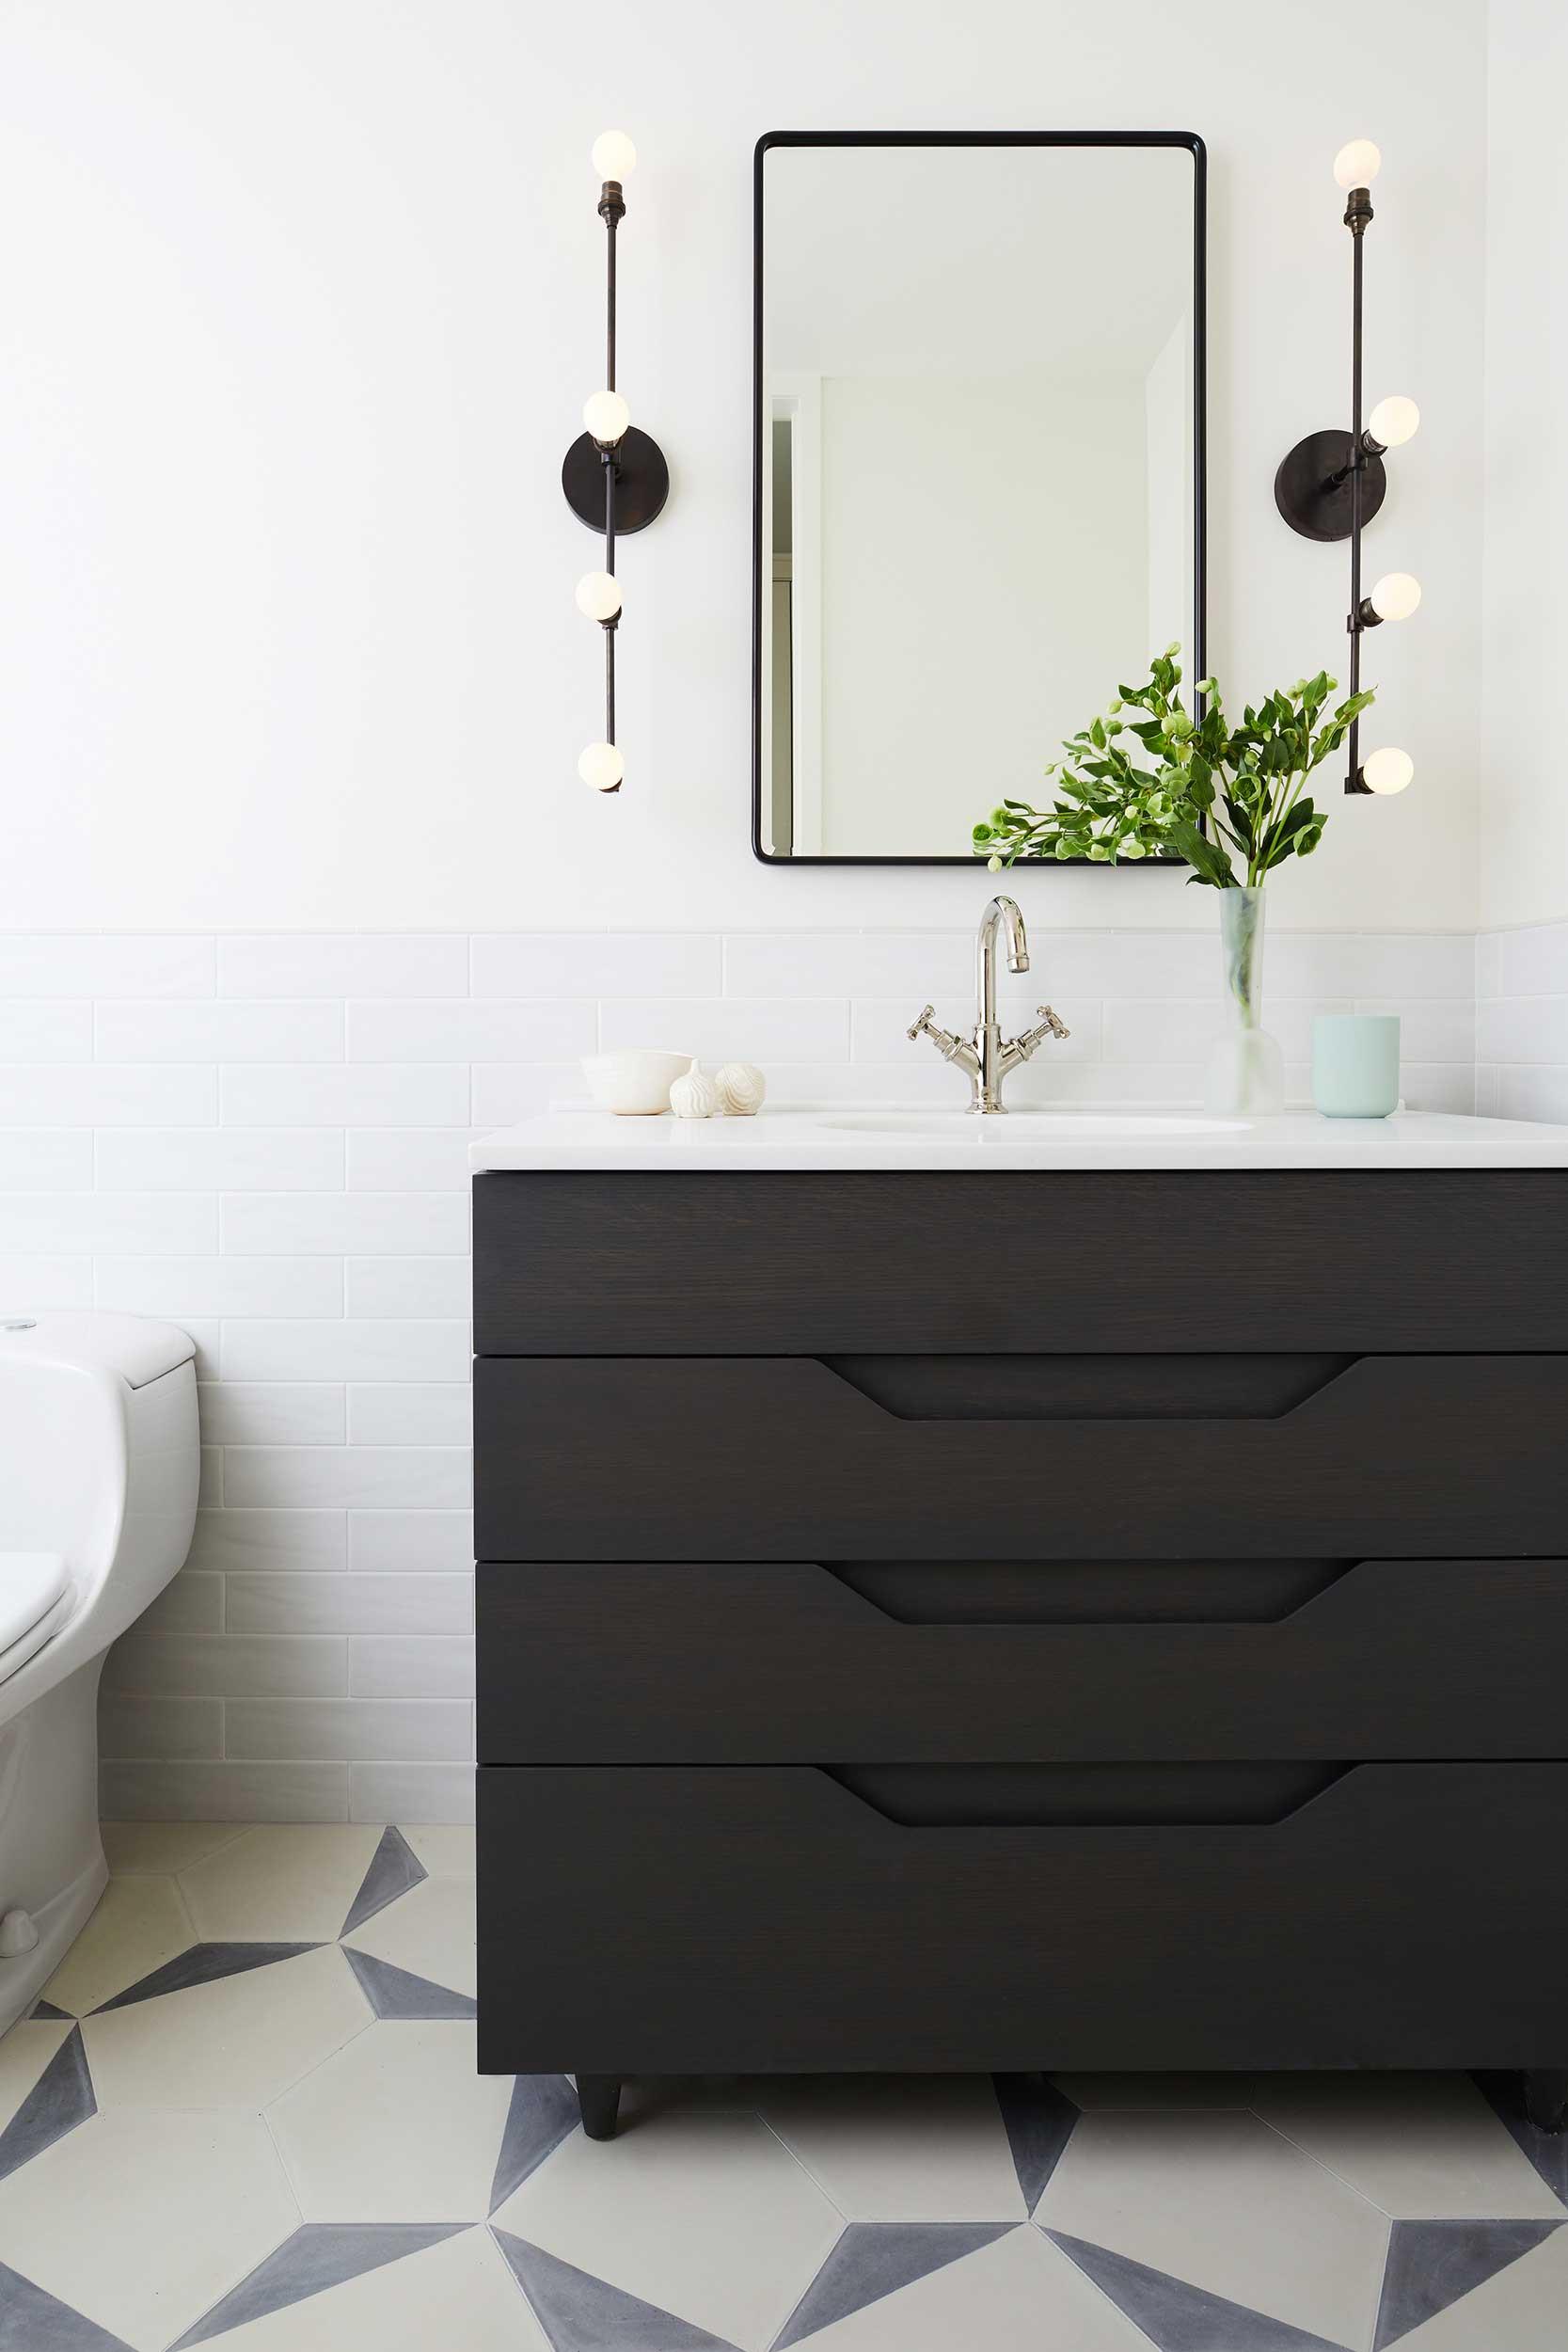 greenwich-street-loft-bathroom-1.jpg